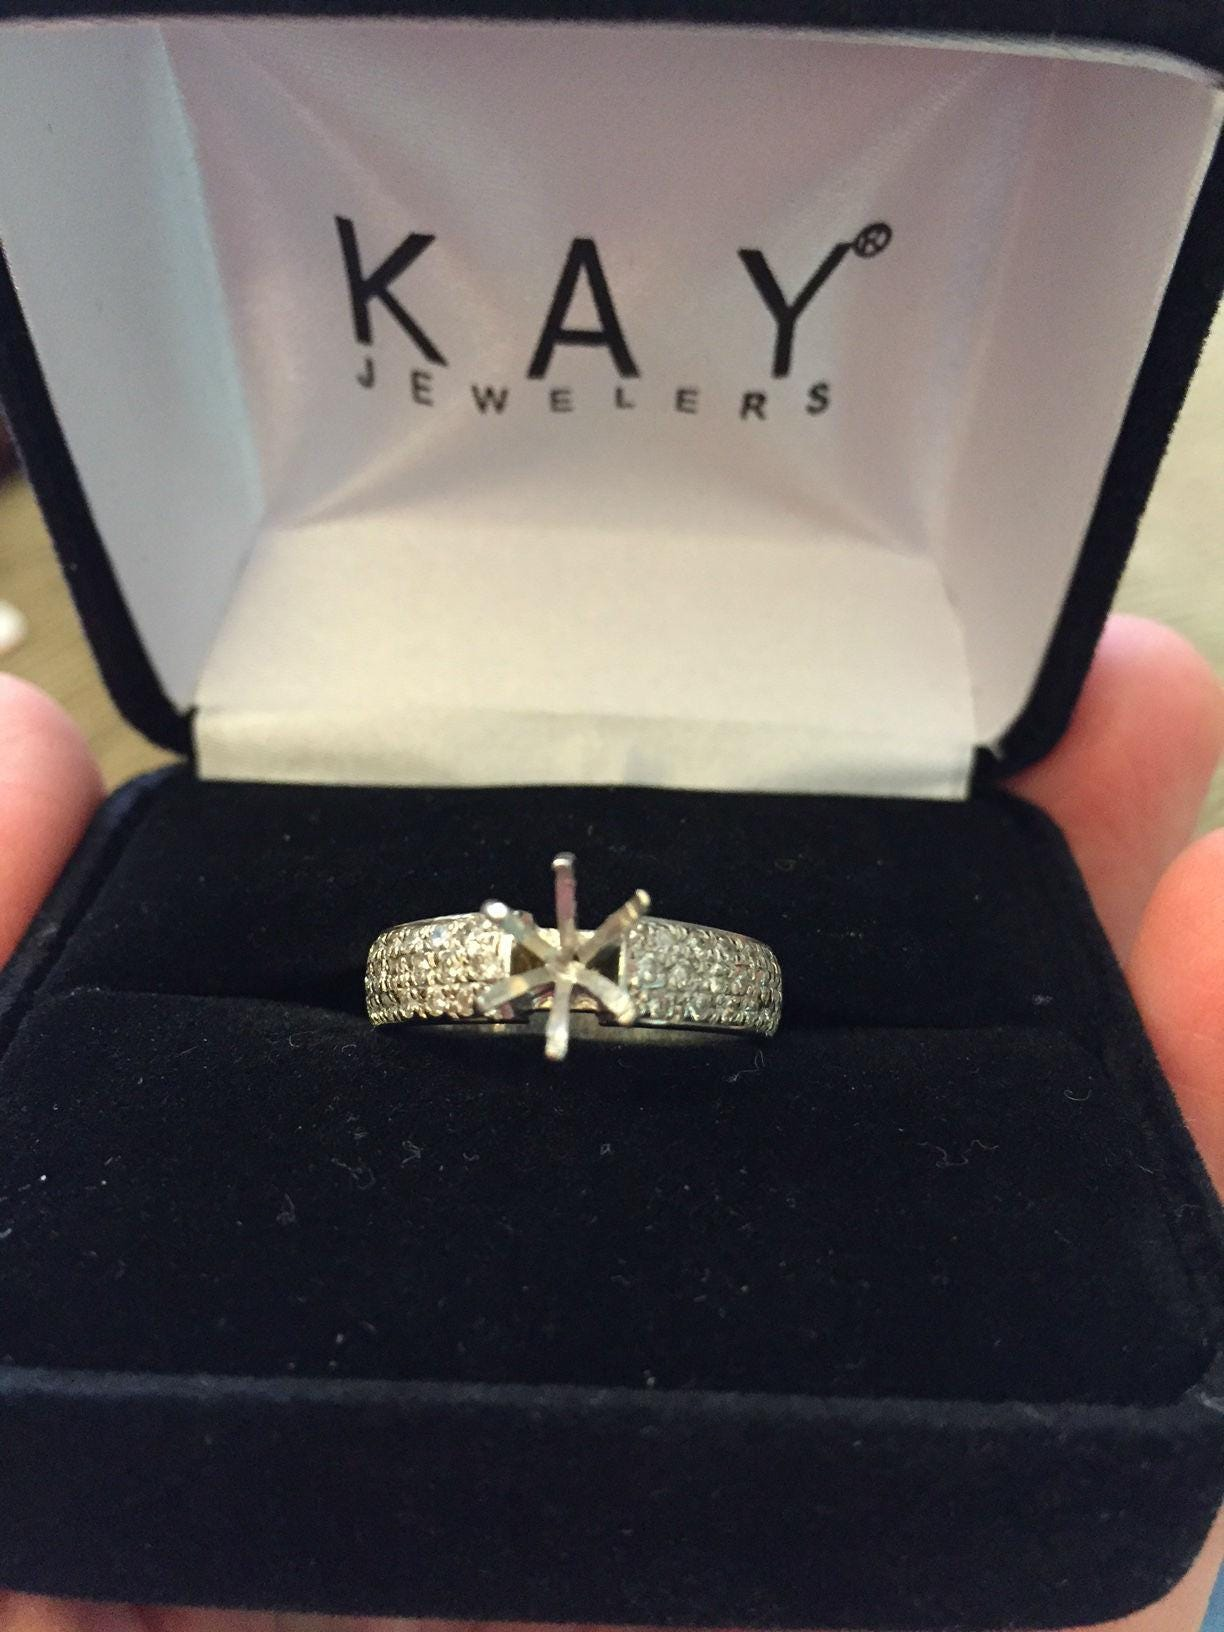 DeWitt woman says Kay Jewelers lost her 8000 diamond